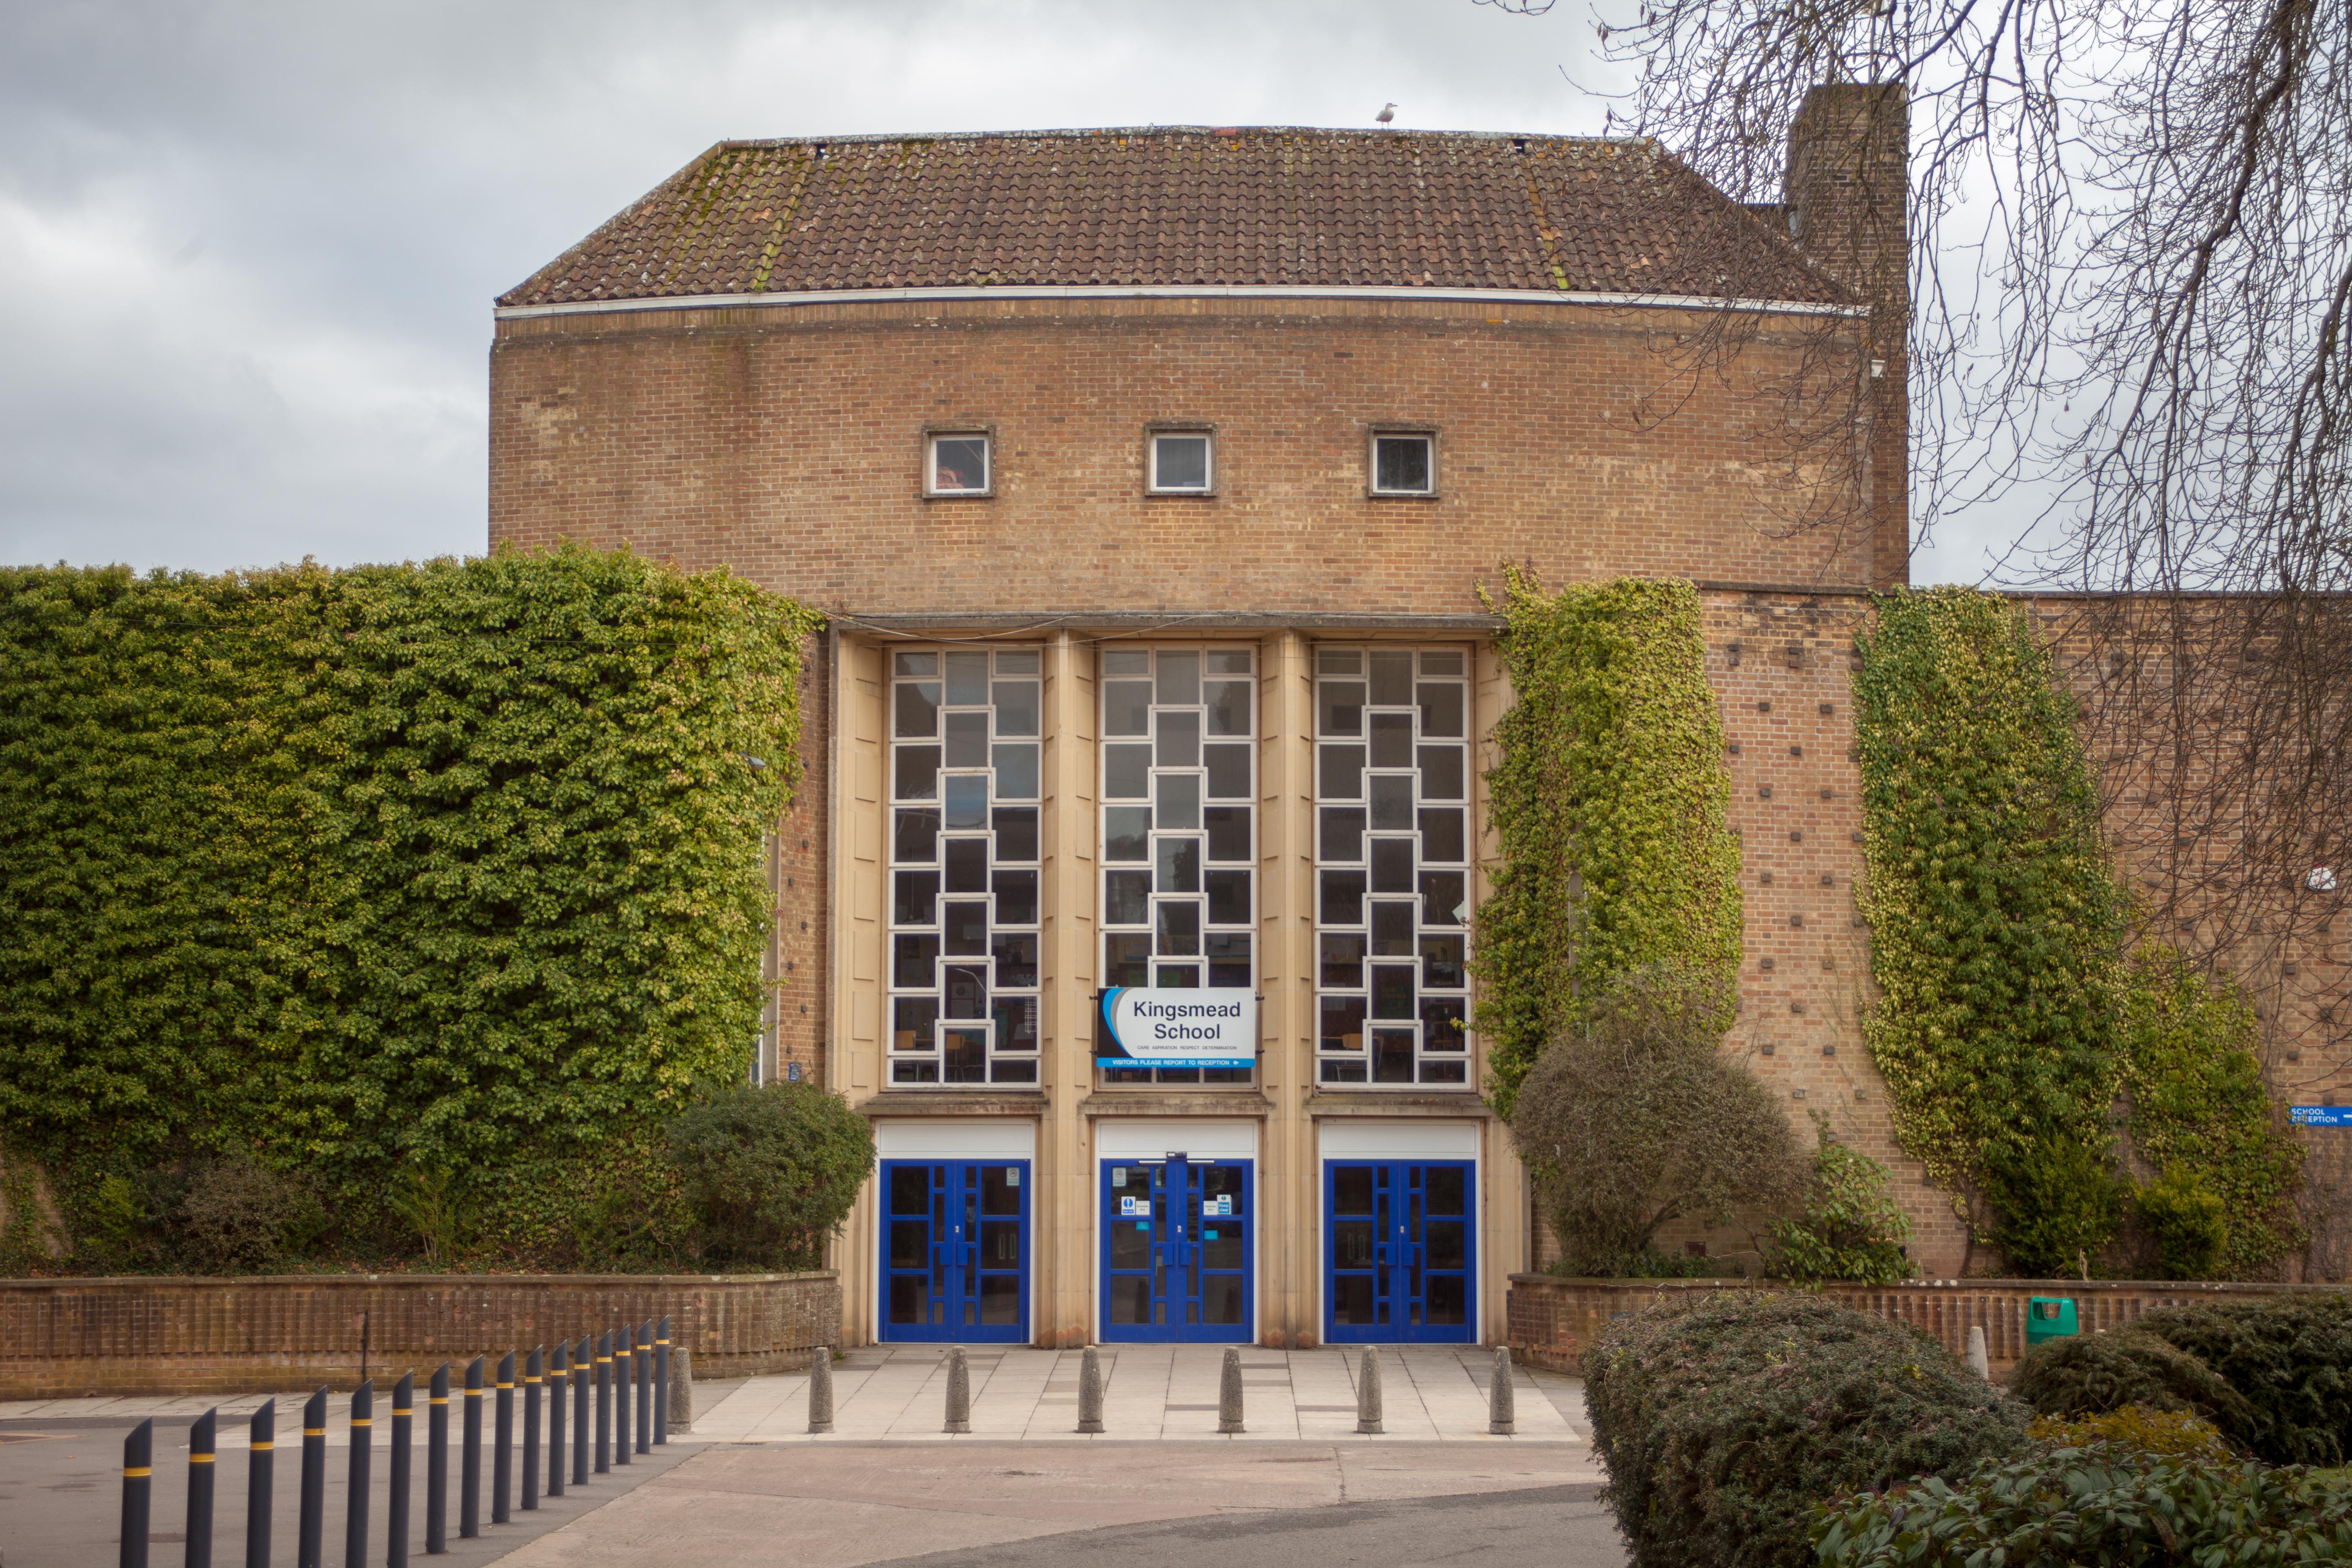 Kingsmead School Wiveliscombe